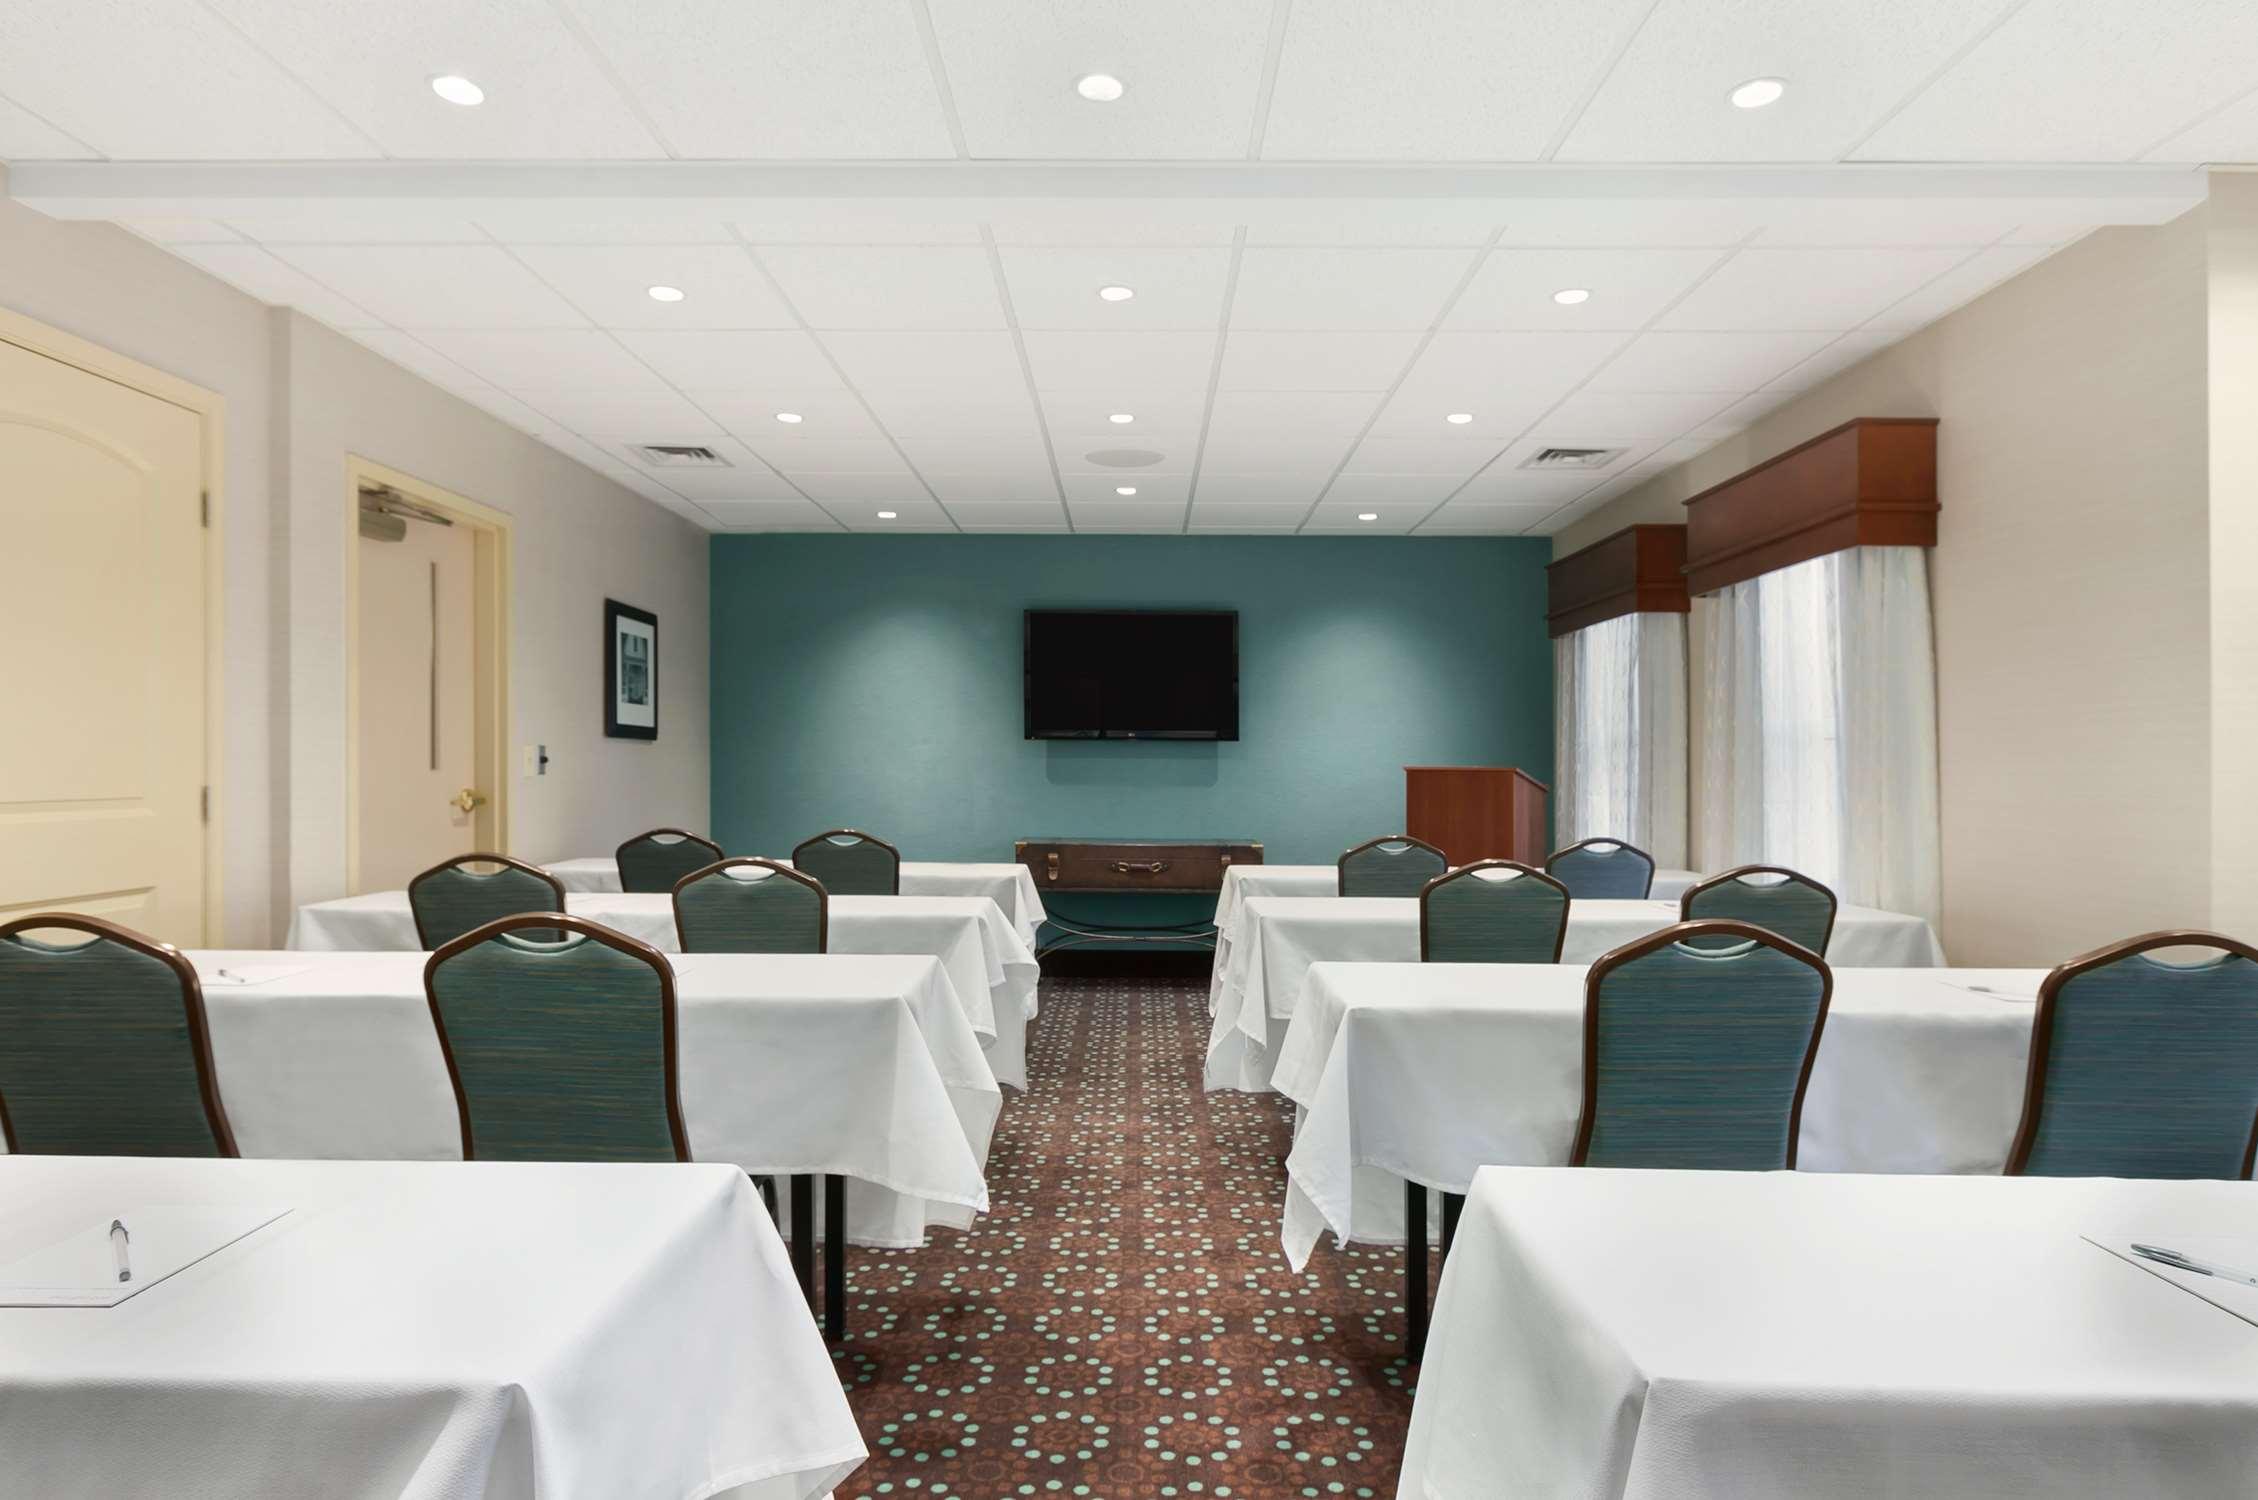 Hampton Inn & Suites Newport News (Oyster Point) image 46